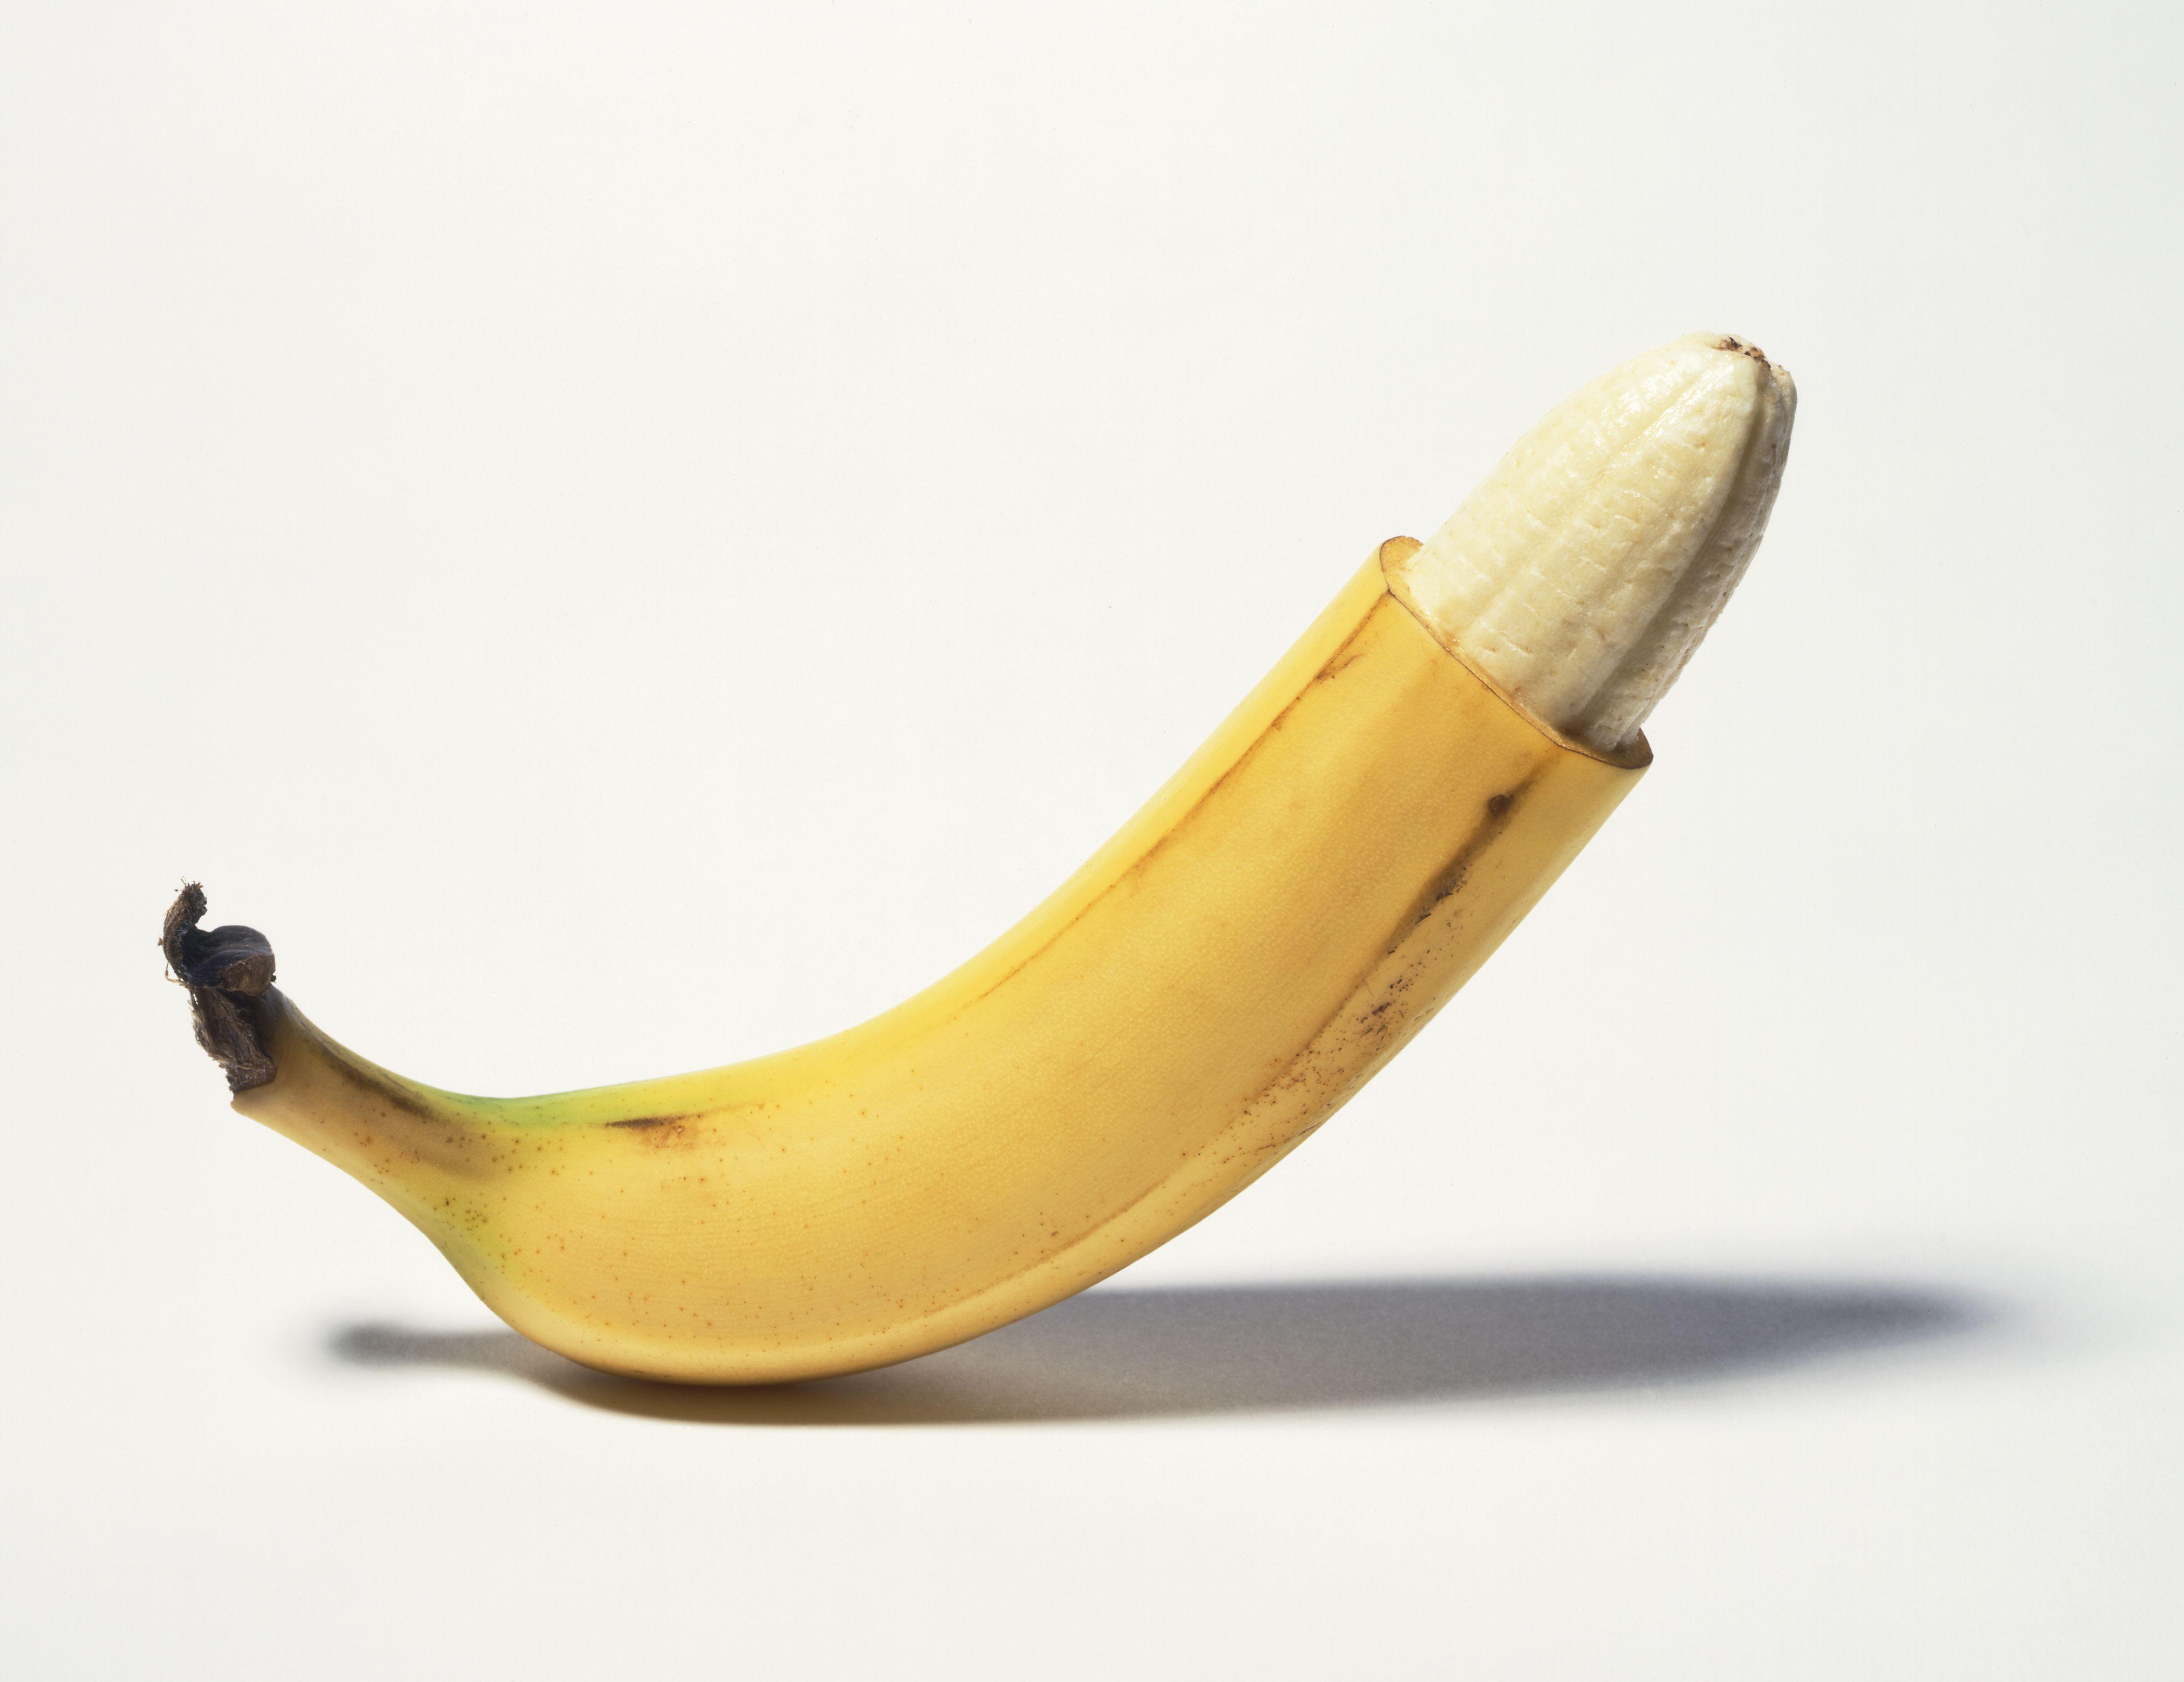 The Reason Some Doctors Argue Men Should Get Circumcised